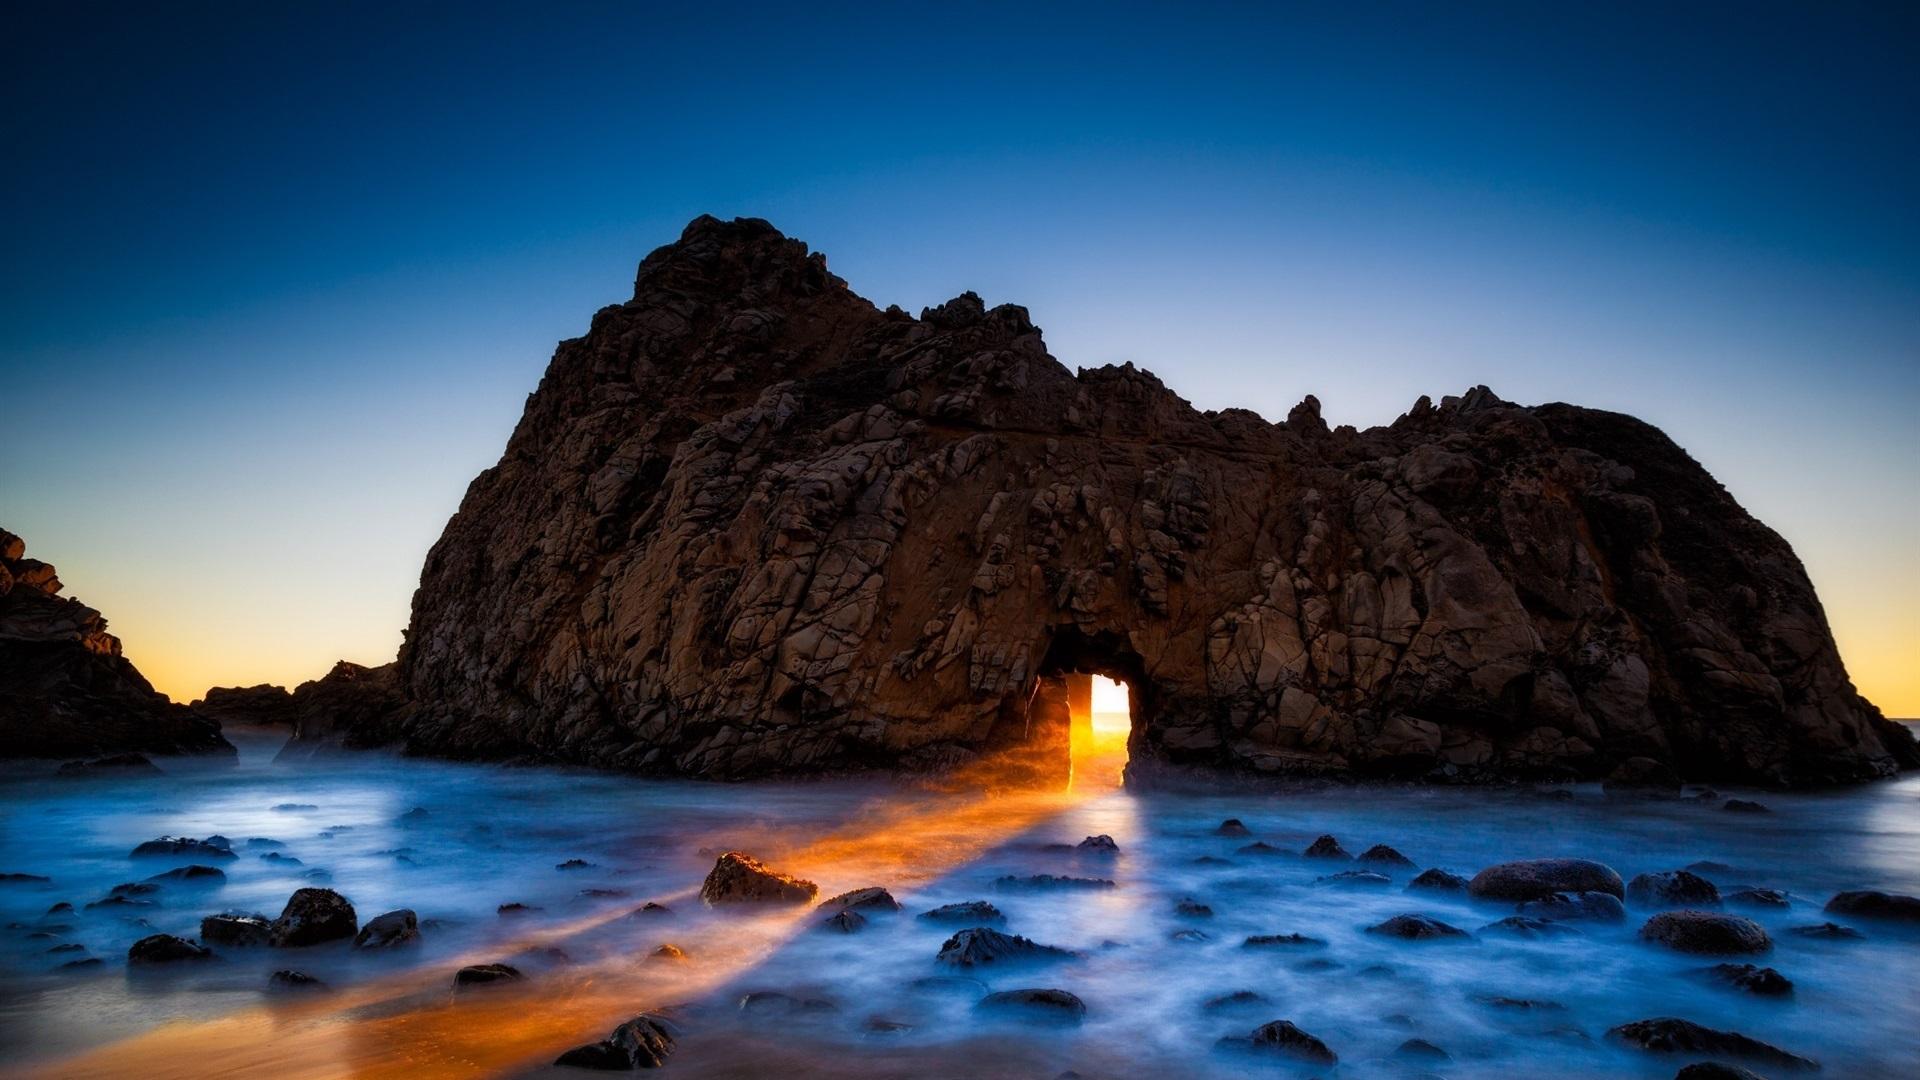 Pacific Ocean Big Sur California Beach 4k Hd Desktop: 壁紙 ファイファービーチ、ビッグ・サー、カリフォルニア州、アメリカ、岩、アーチ、海 1920x1200 HD 無料の